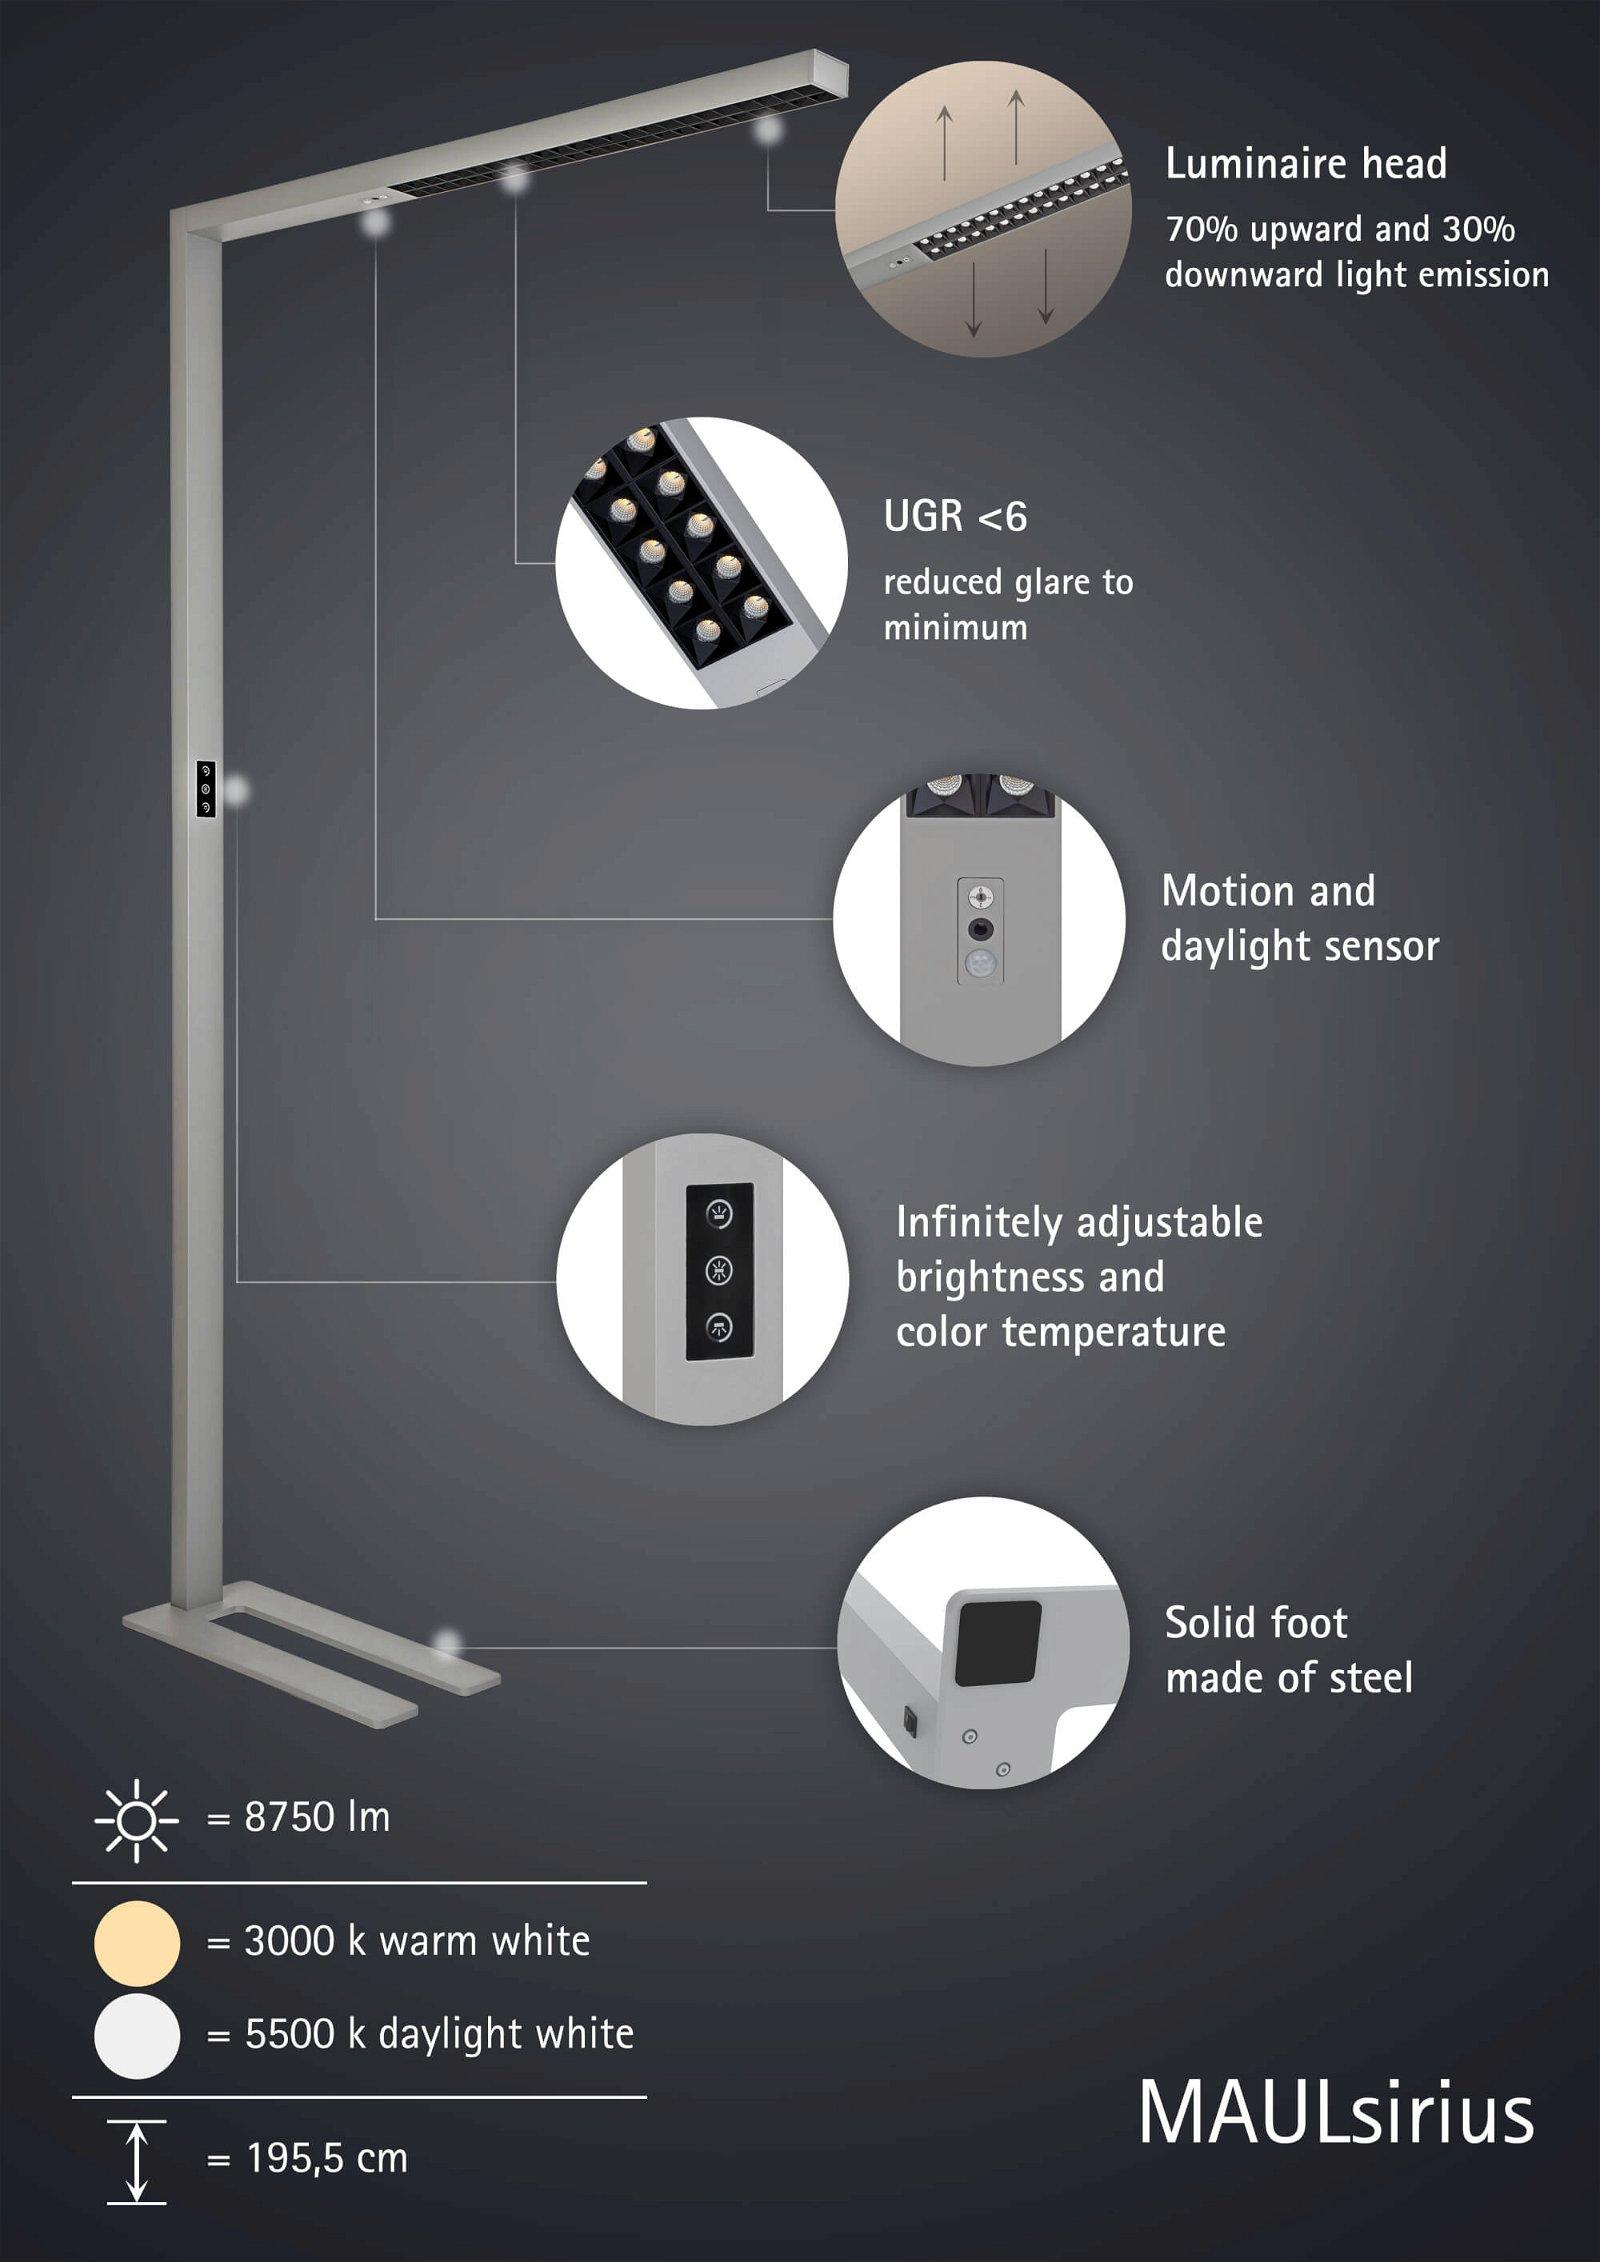 LED-Standleuchte MAULsirius colour vario sensor, dimmbar